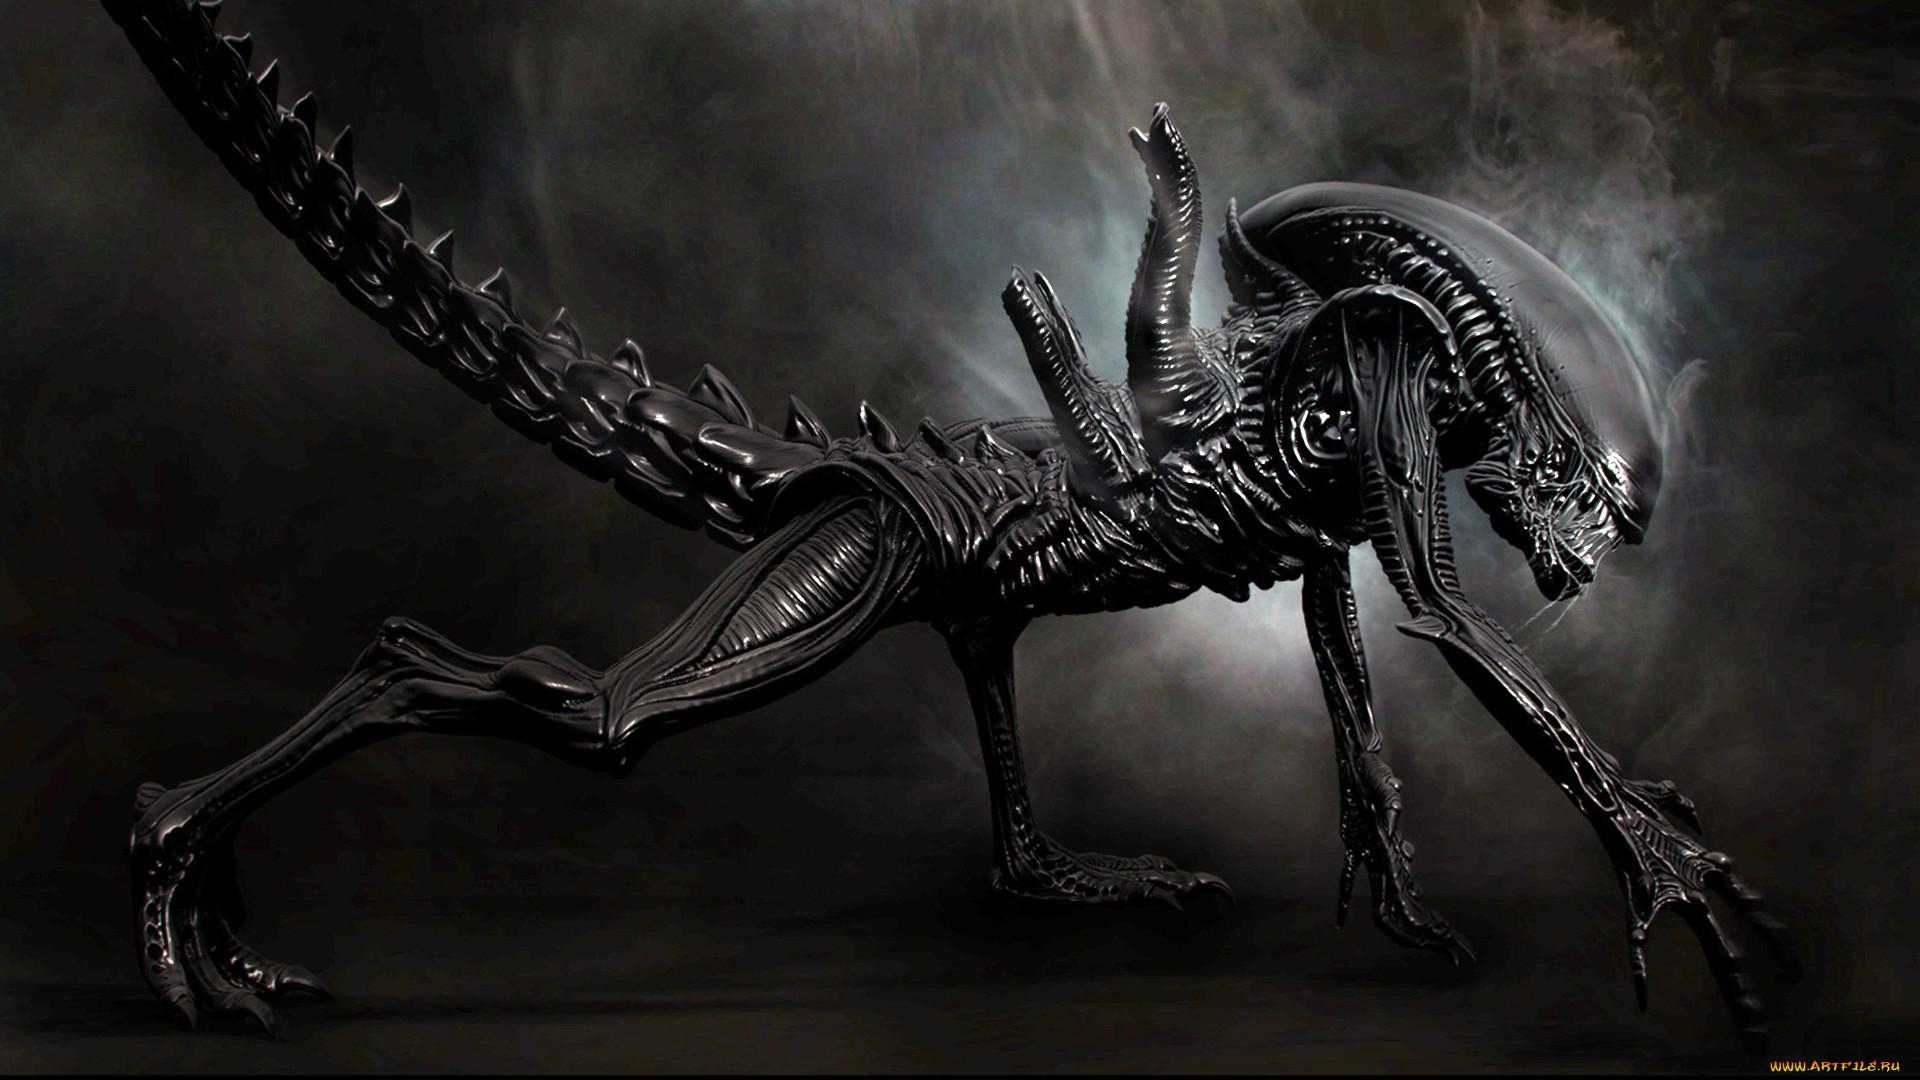 Alien 965681 Alien 965668 Alien 965698 Alien 965685 Alien 965695 1920x1080